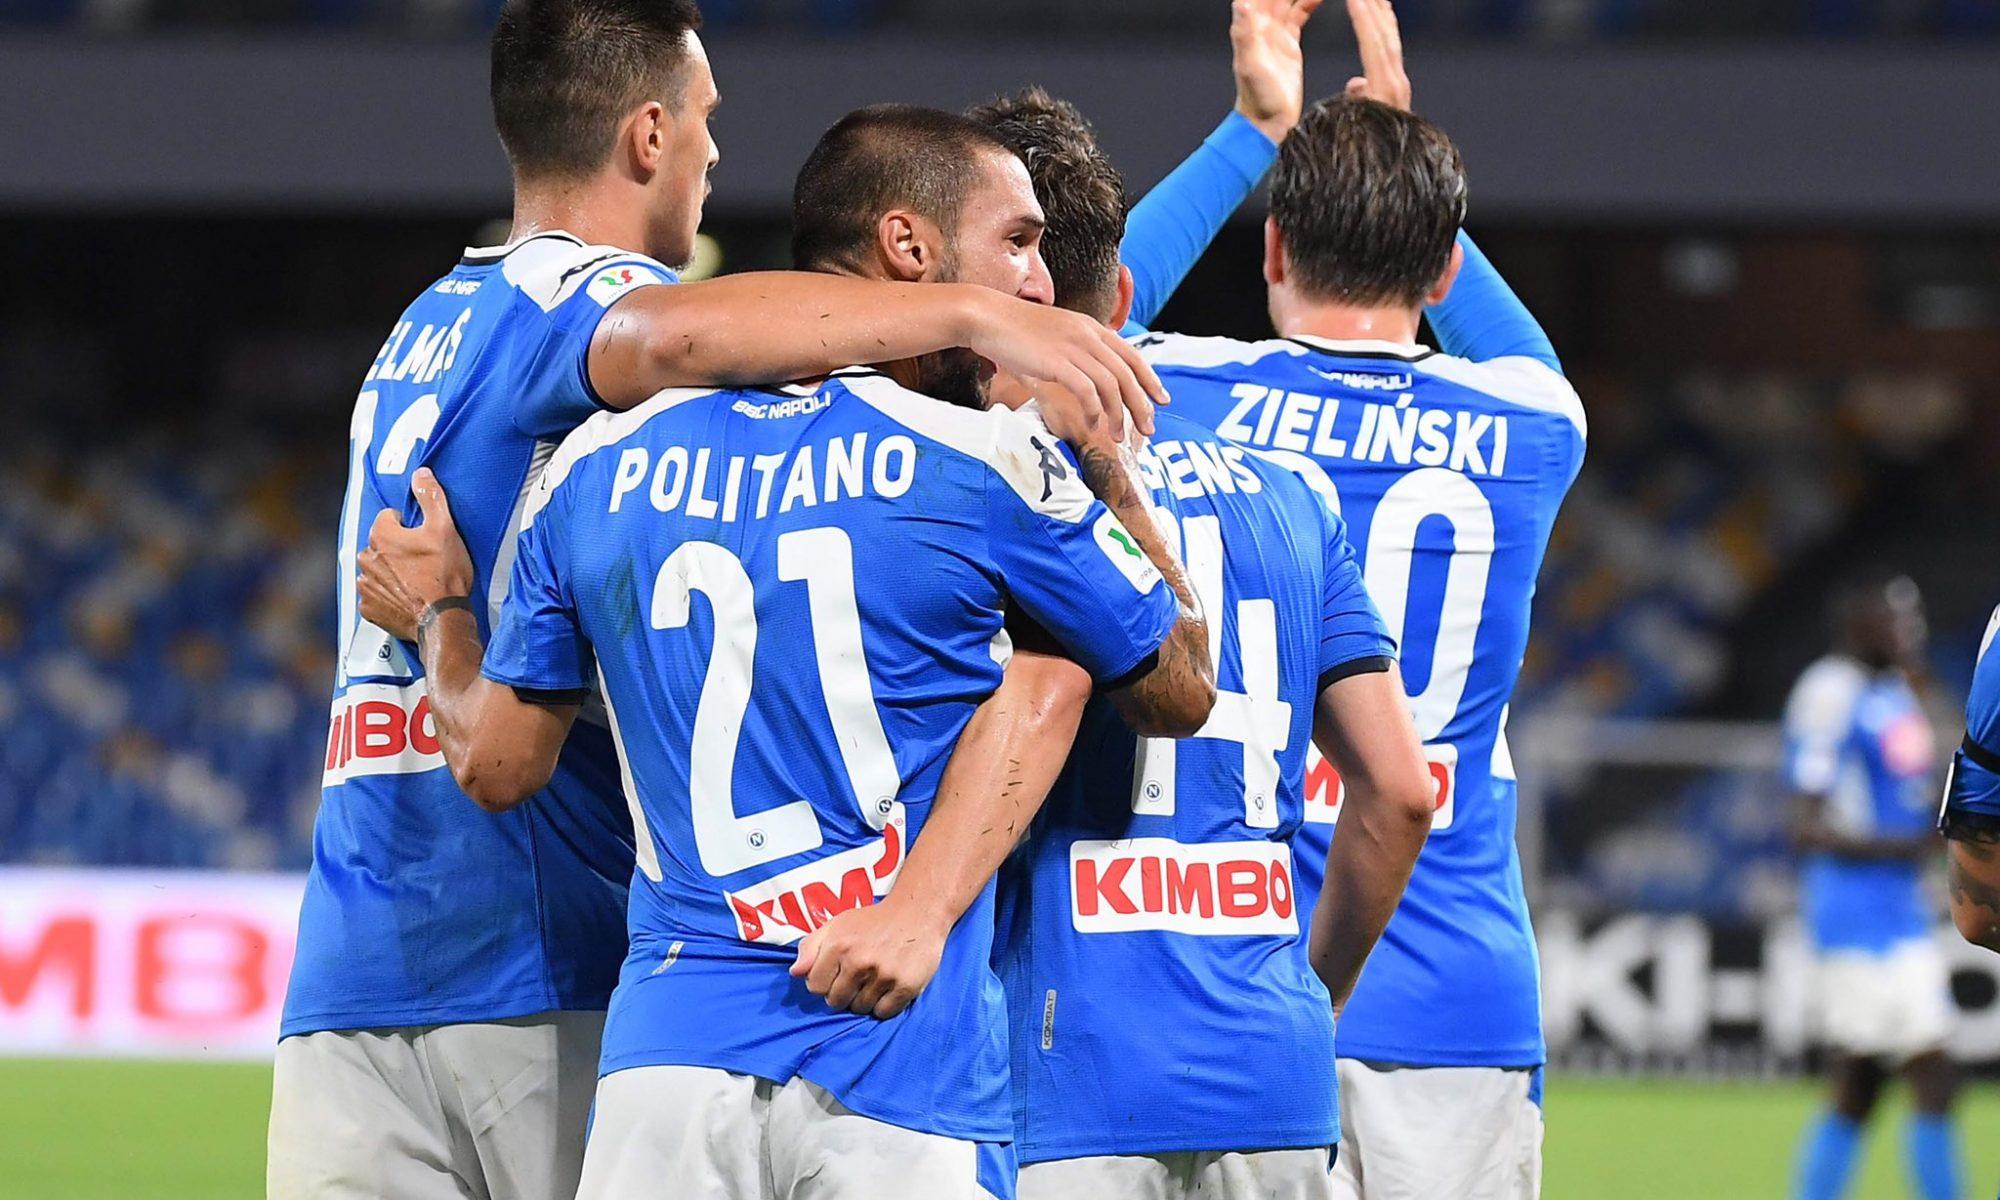 Napoli-Udinese 2-1, la decide Politano